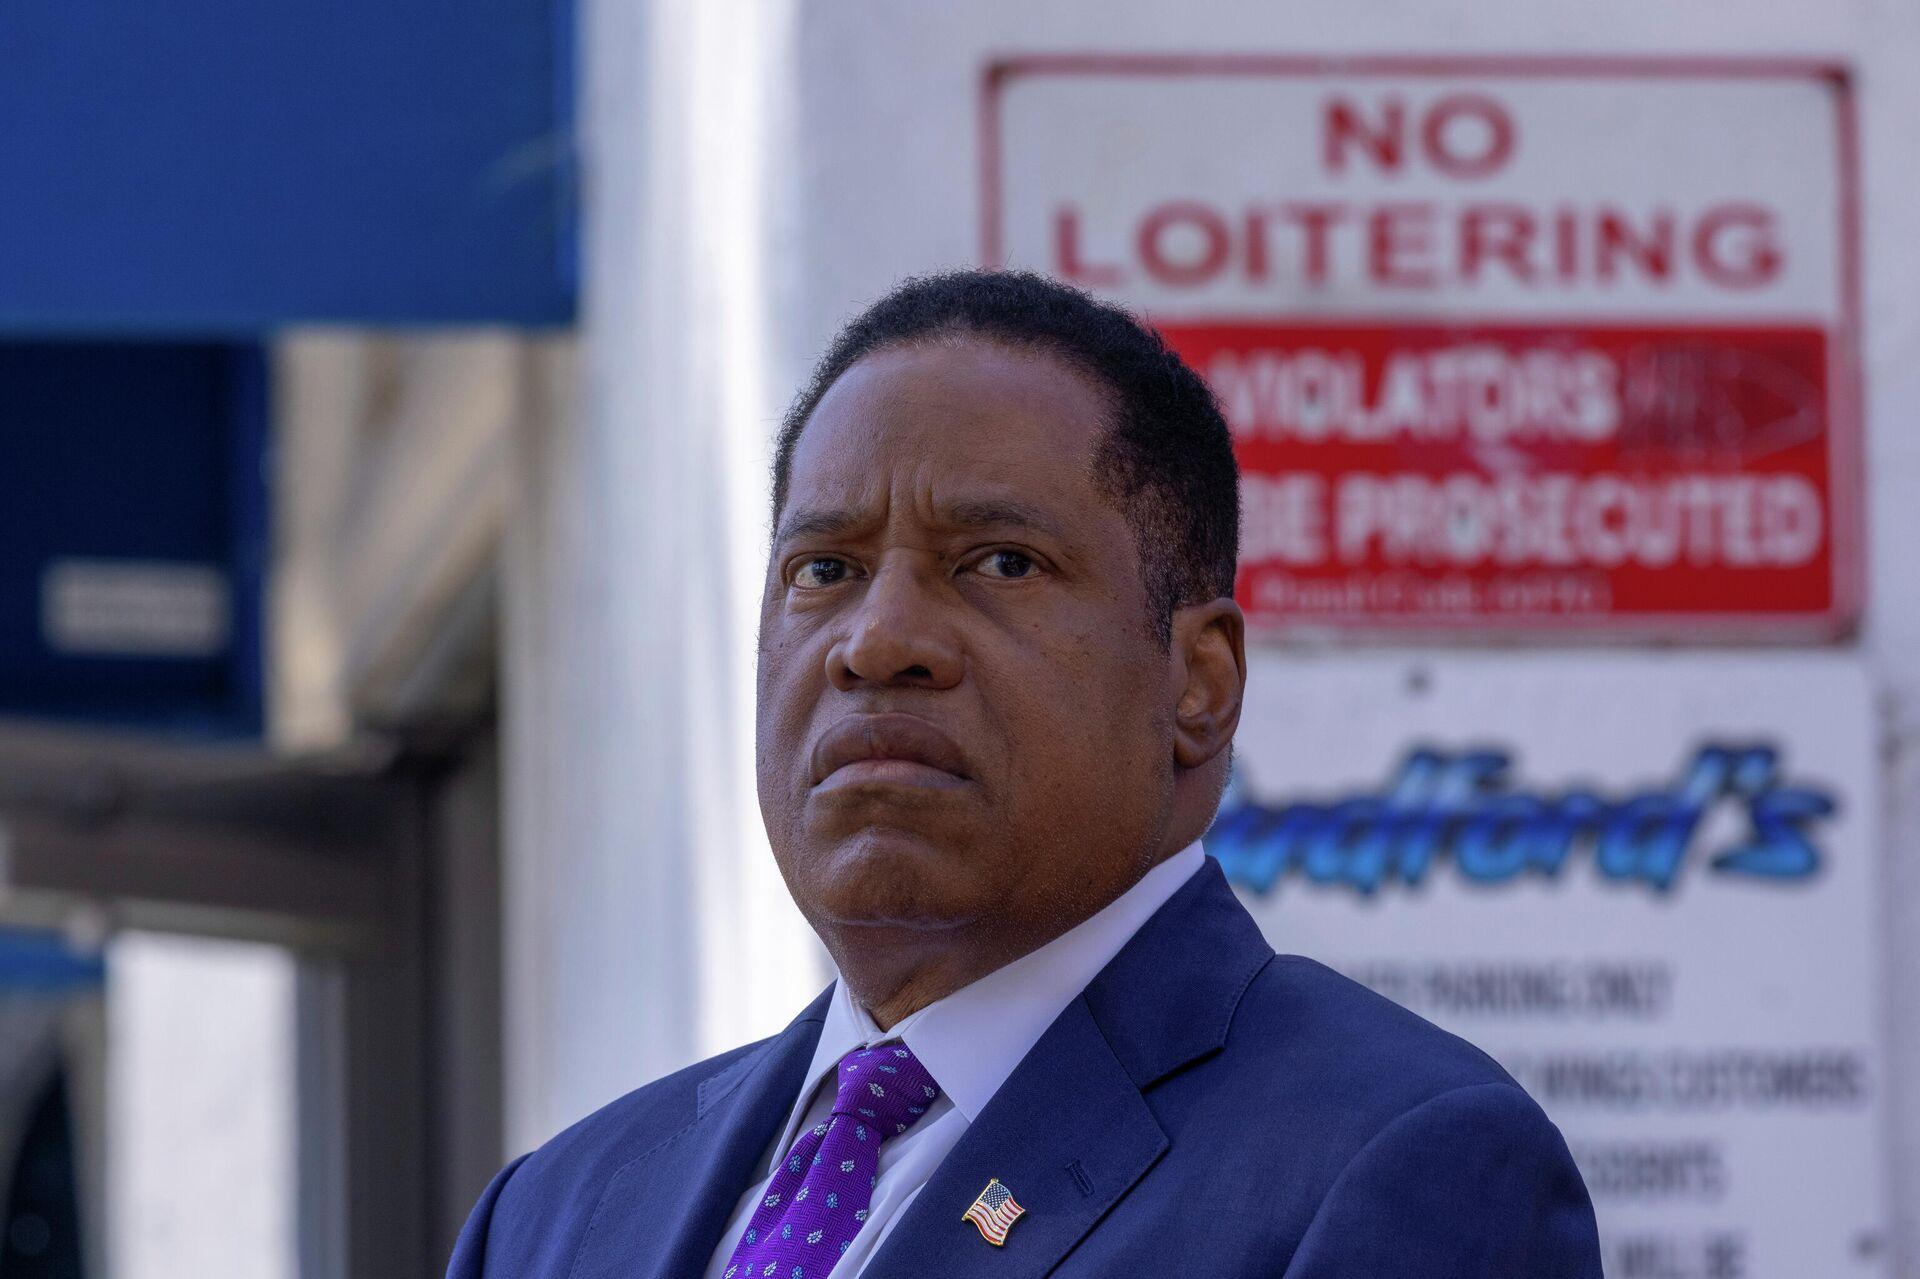 Republican gubernatorial candidate Larry Elder makes a campaign stop outside a restaurant in San Diego, California, U.S. September 3, 2021 - Sputnik International, 1920, 14.09.2021